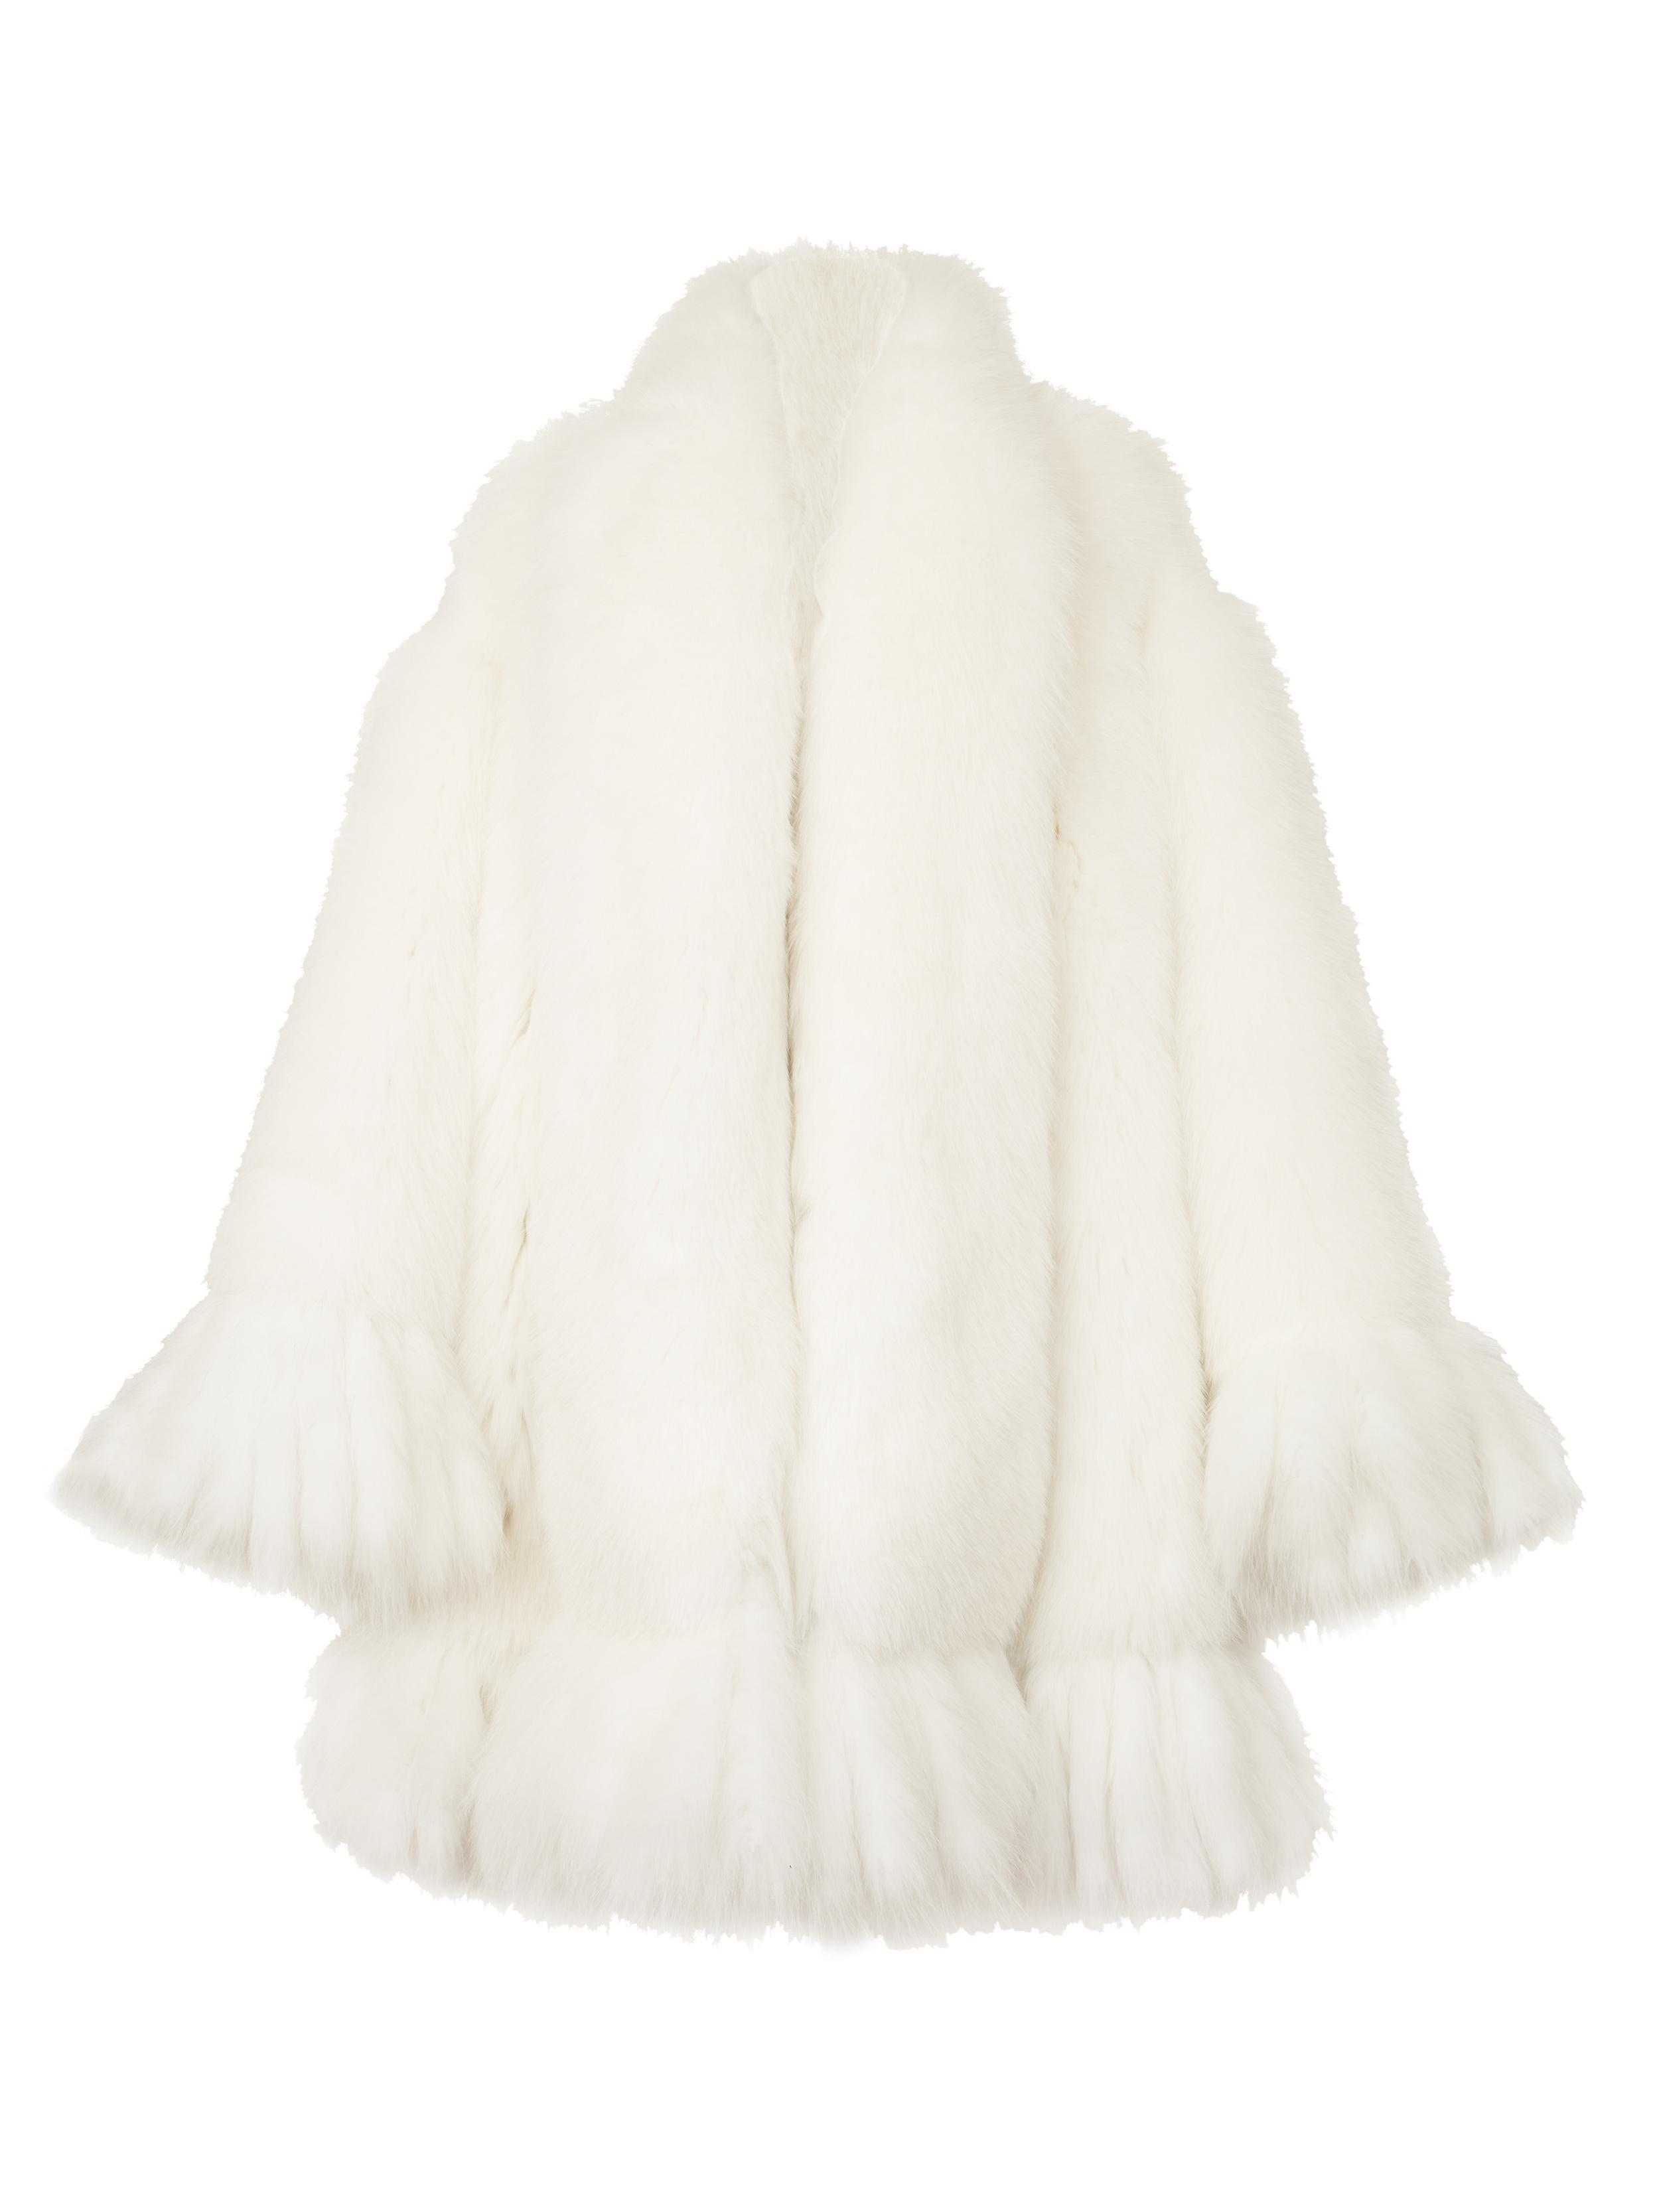 P6010-F, Fox Tail A-Line Coat, Ivory.jpg